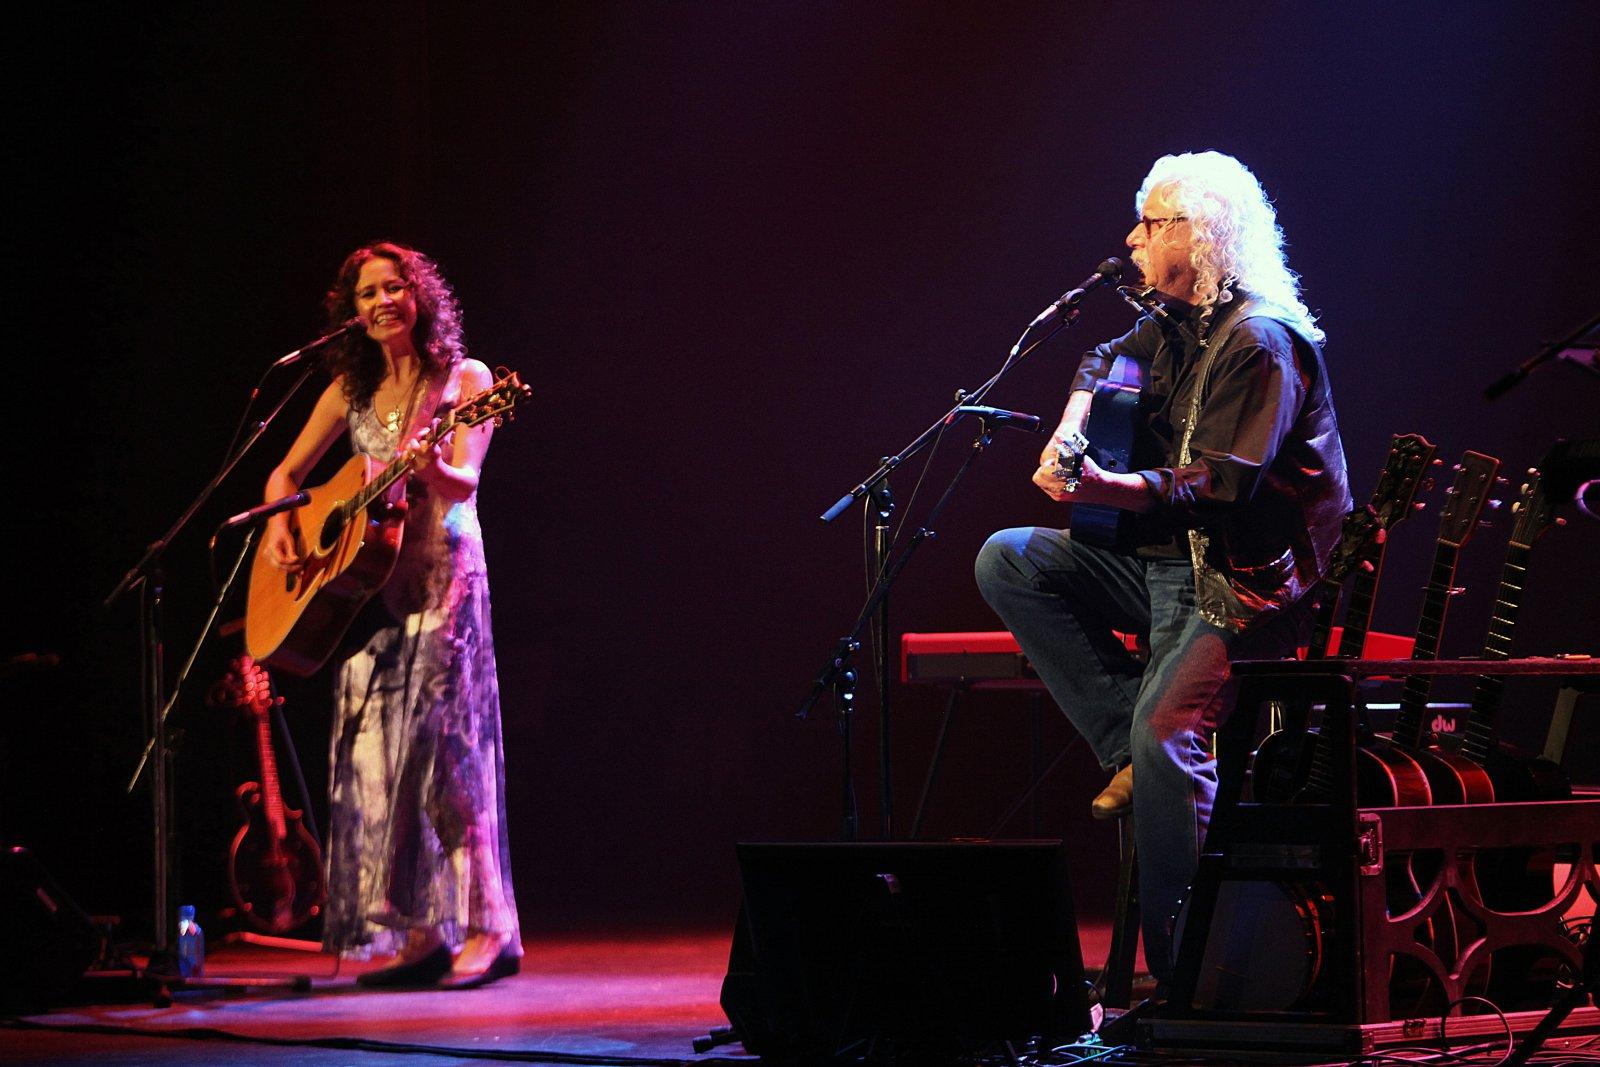 Sarah Lee Guthrie and Arlo Guthrie